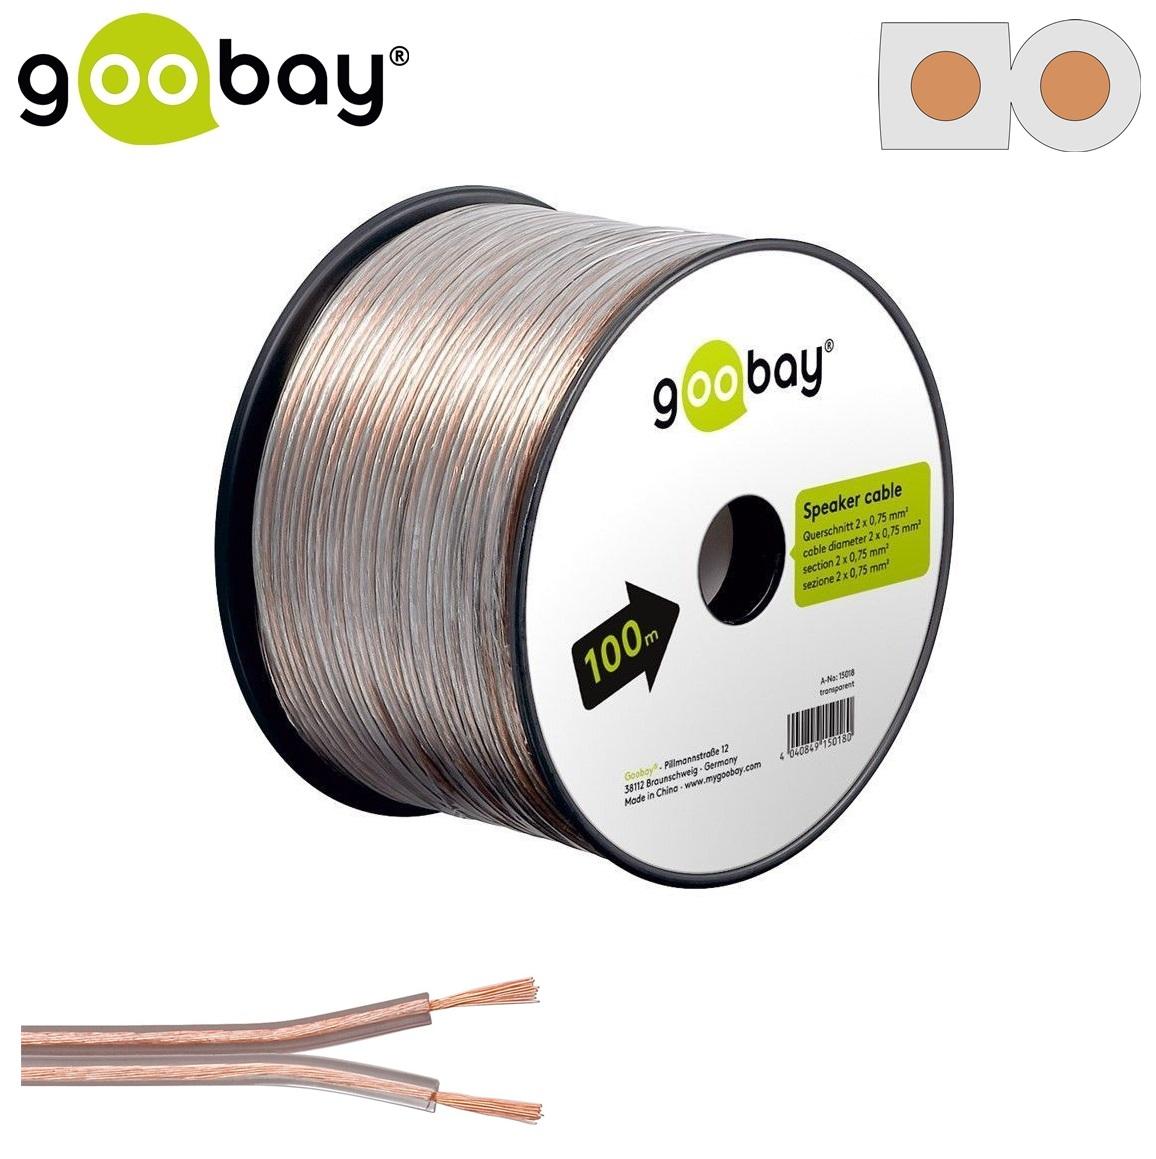 Speaker cable (100 m Макара 2x0.75mm)GOOBAY